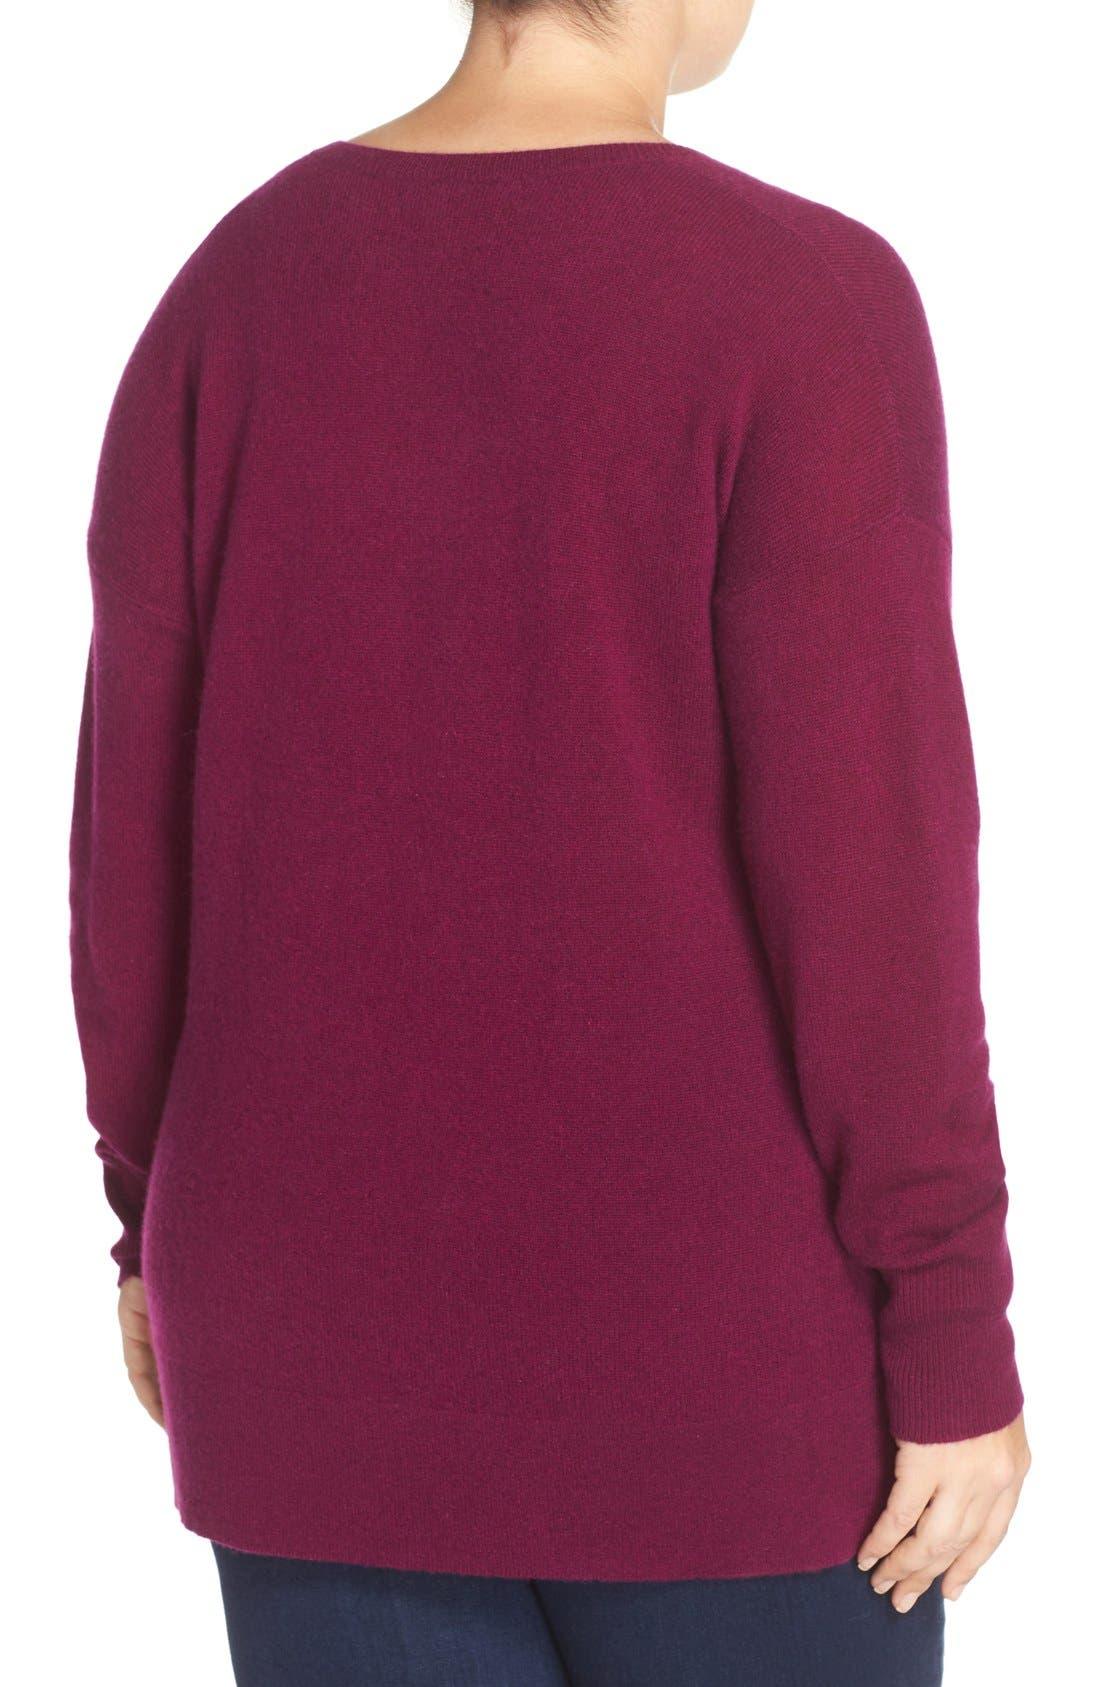 Alternate Image 3  - Halogen® V-Neck Cashmere Sweater (Plus Size)